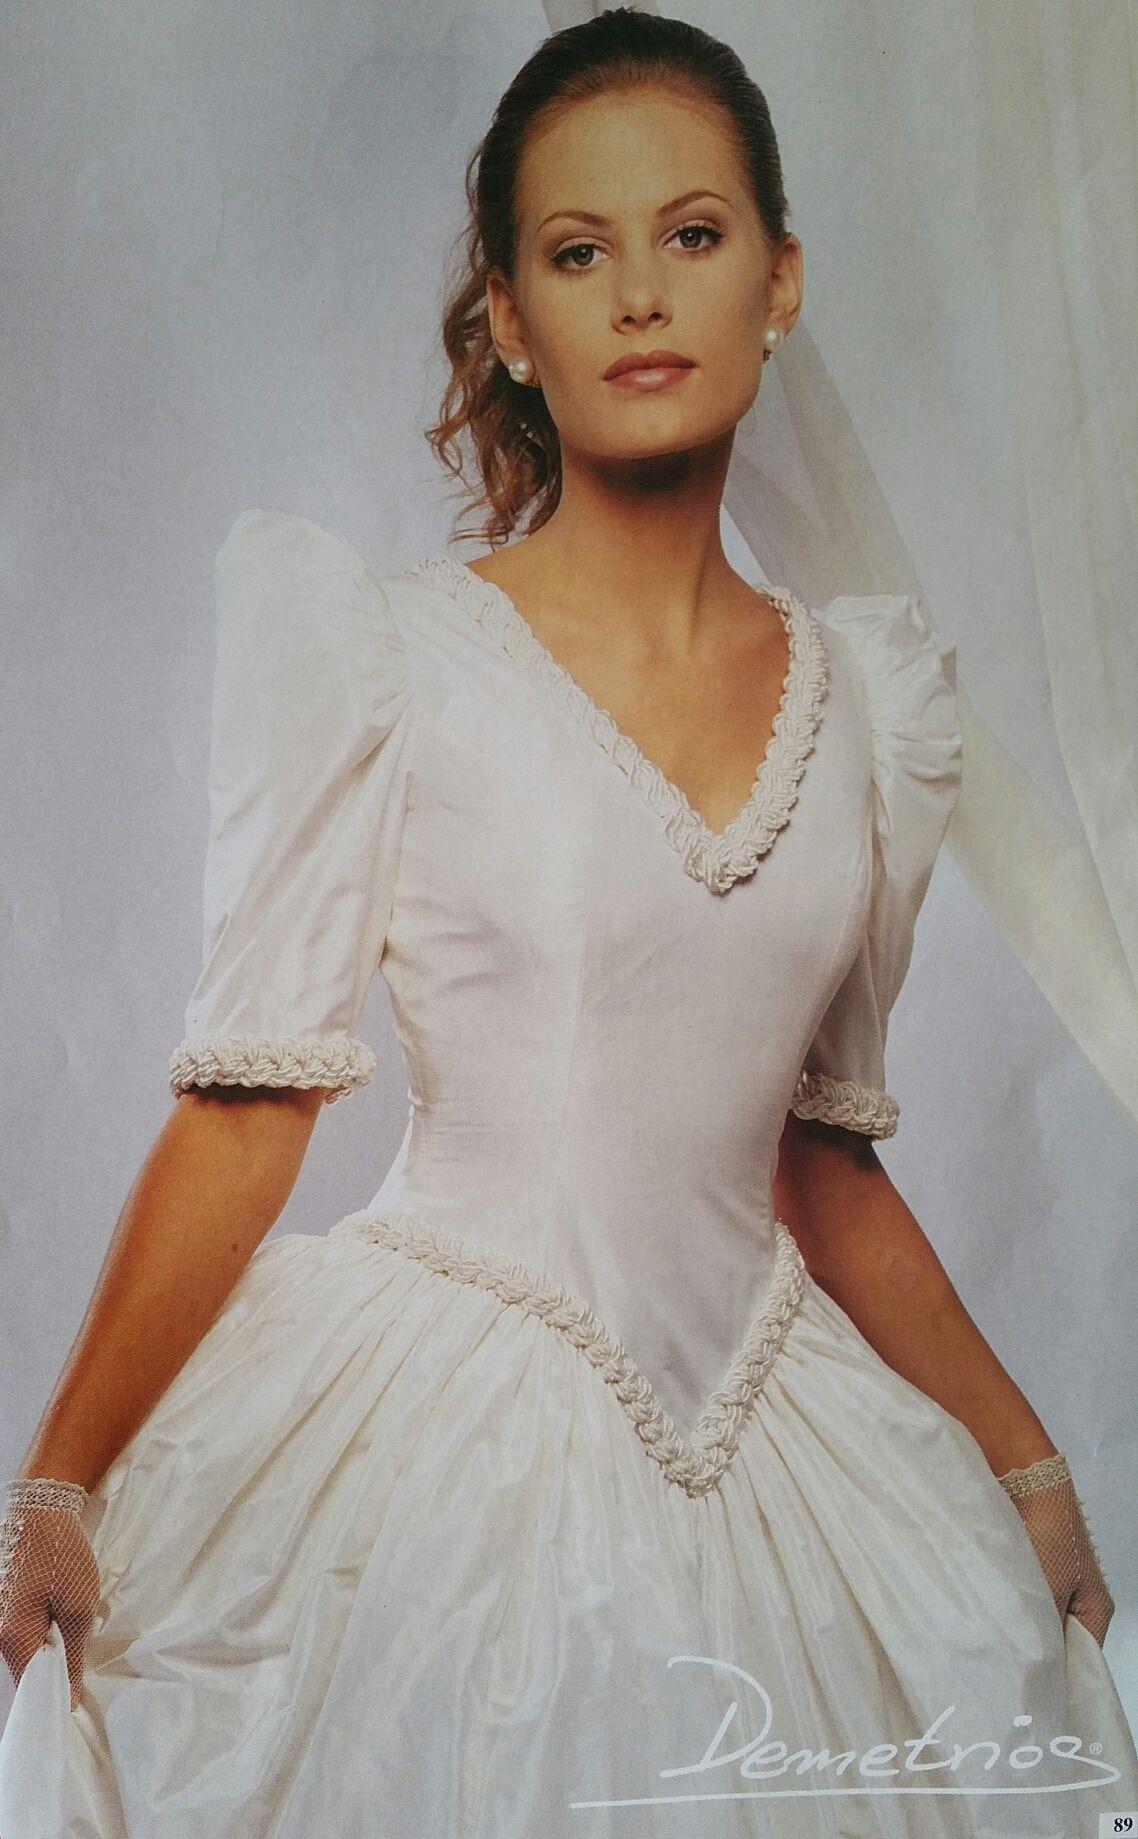 Demetrios Wedding Veils  Demetrios 1994 pure silk gown